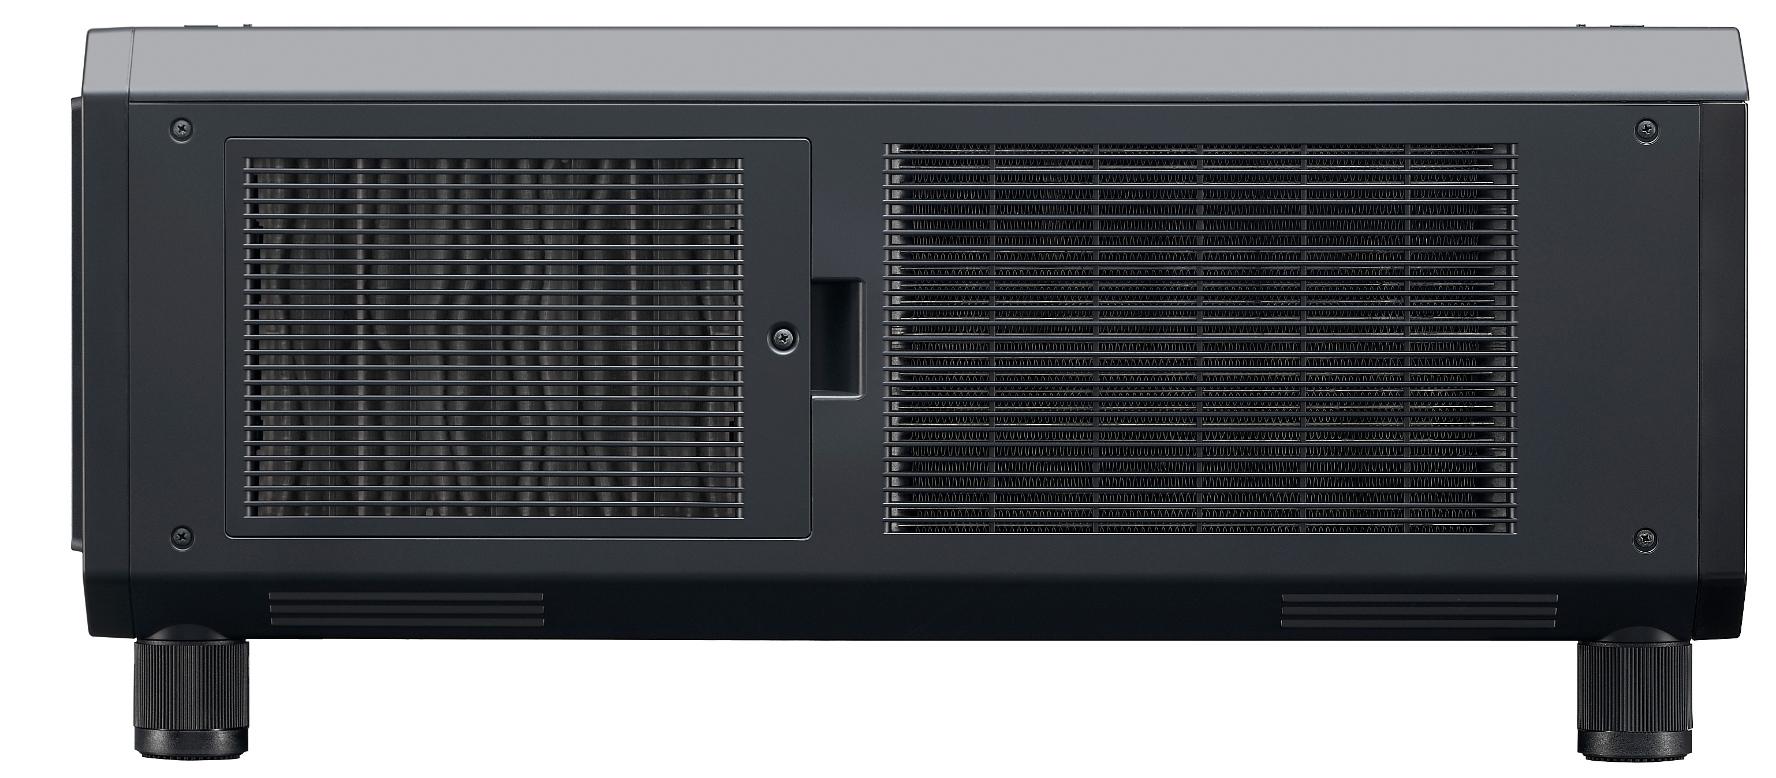 12000 Lumen WUXGA 3-Chip DLP Laser Projector - No Lens